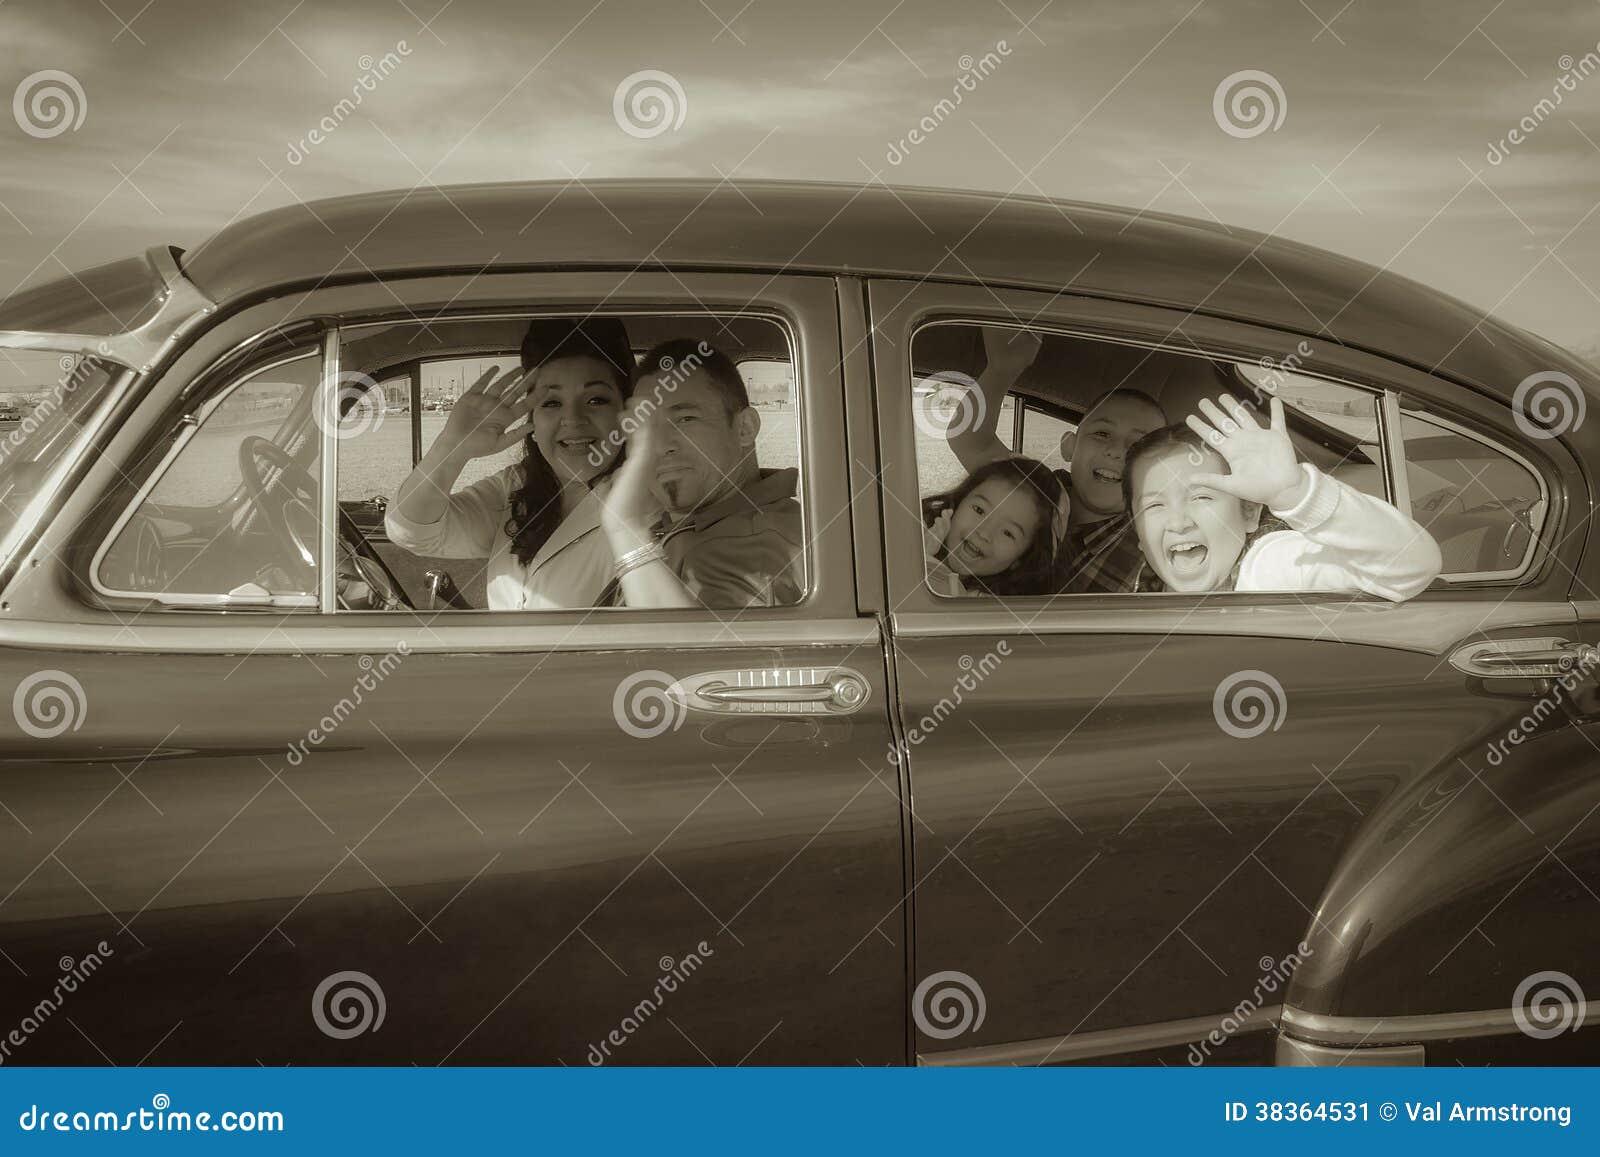 Family Waving Hello in Vintage Car